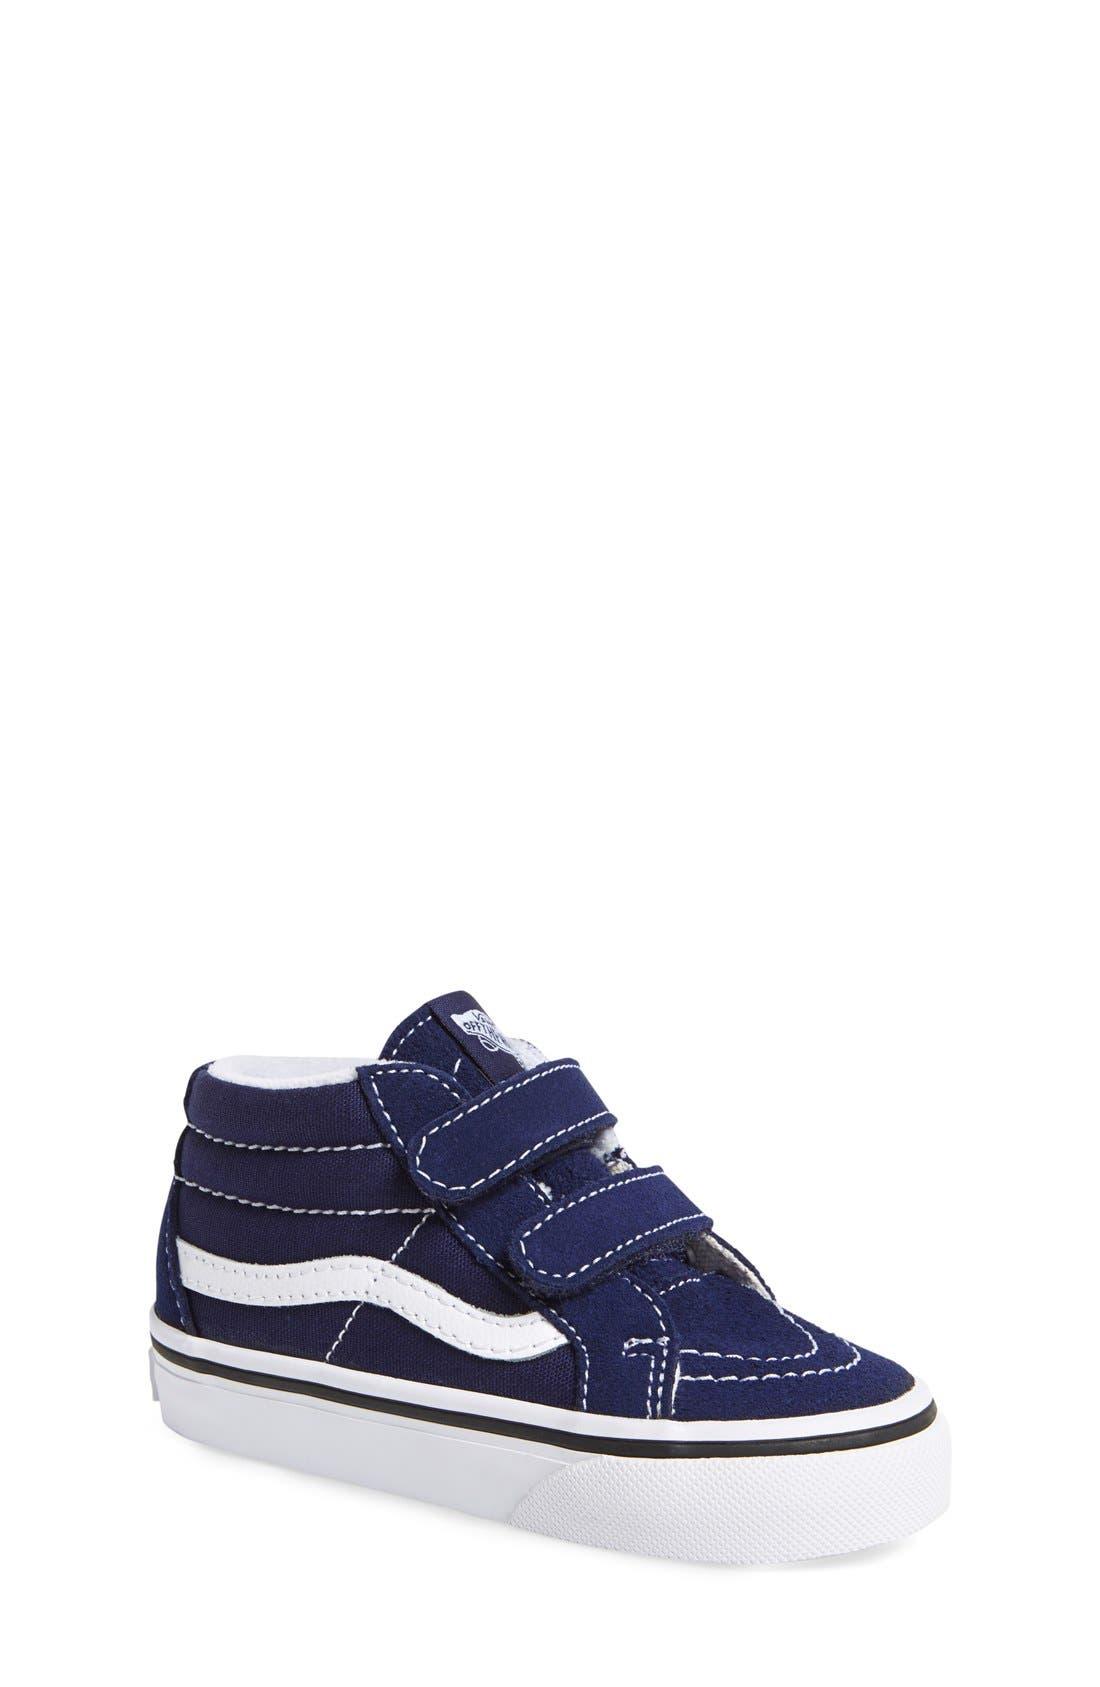 Vans'Sk8-Hi Reissue V' Sneaker (Baby, Walker, Toddler, Little Kid & Big Kid)